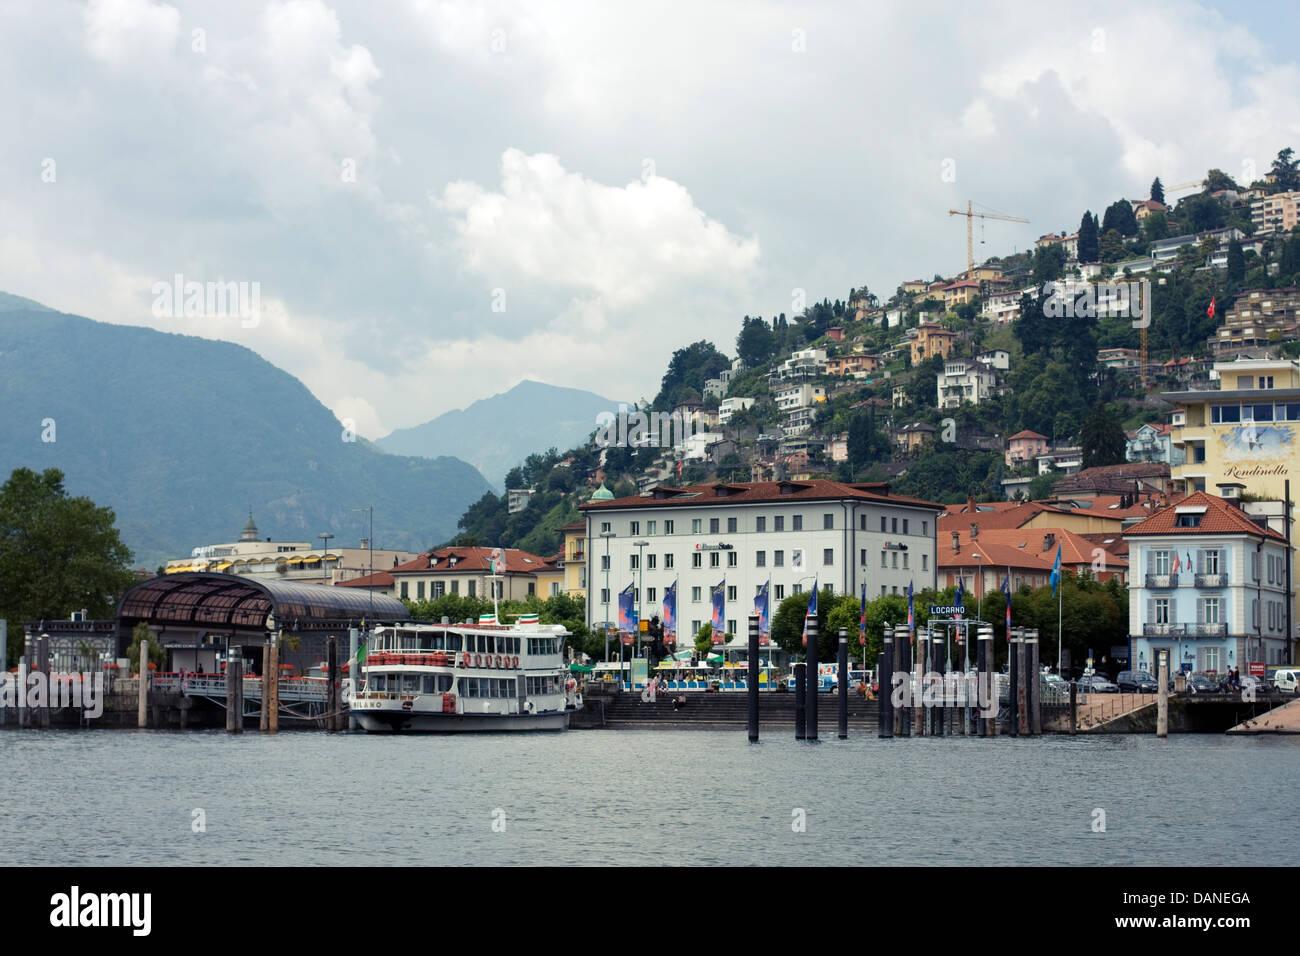 Harbor of Locarno, Ticino, Switzerland. - Stock Image